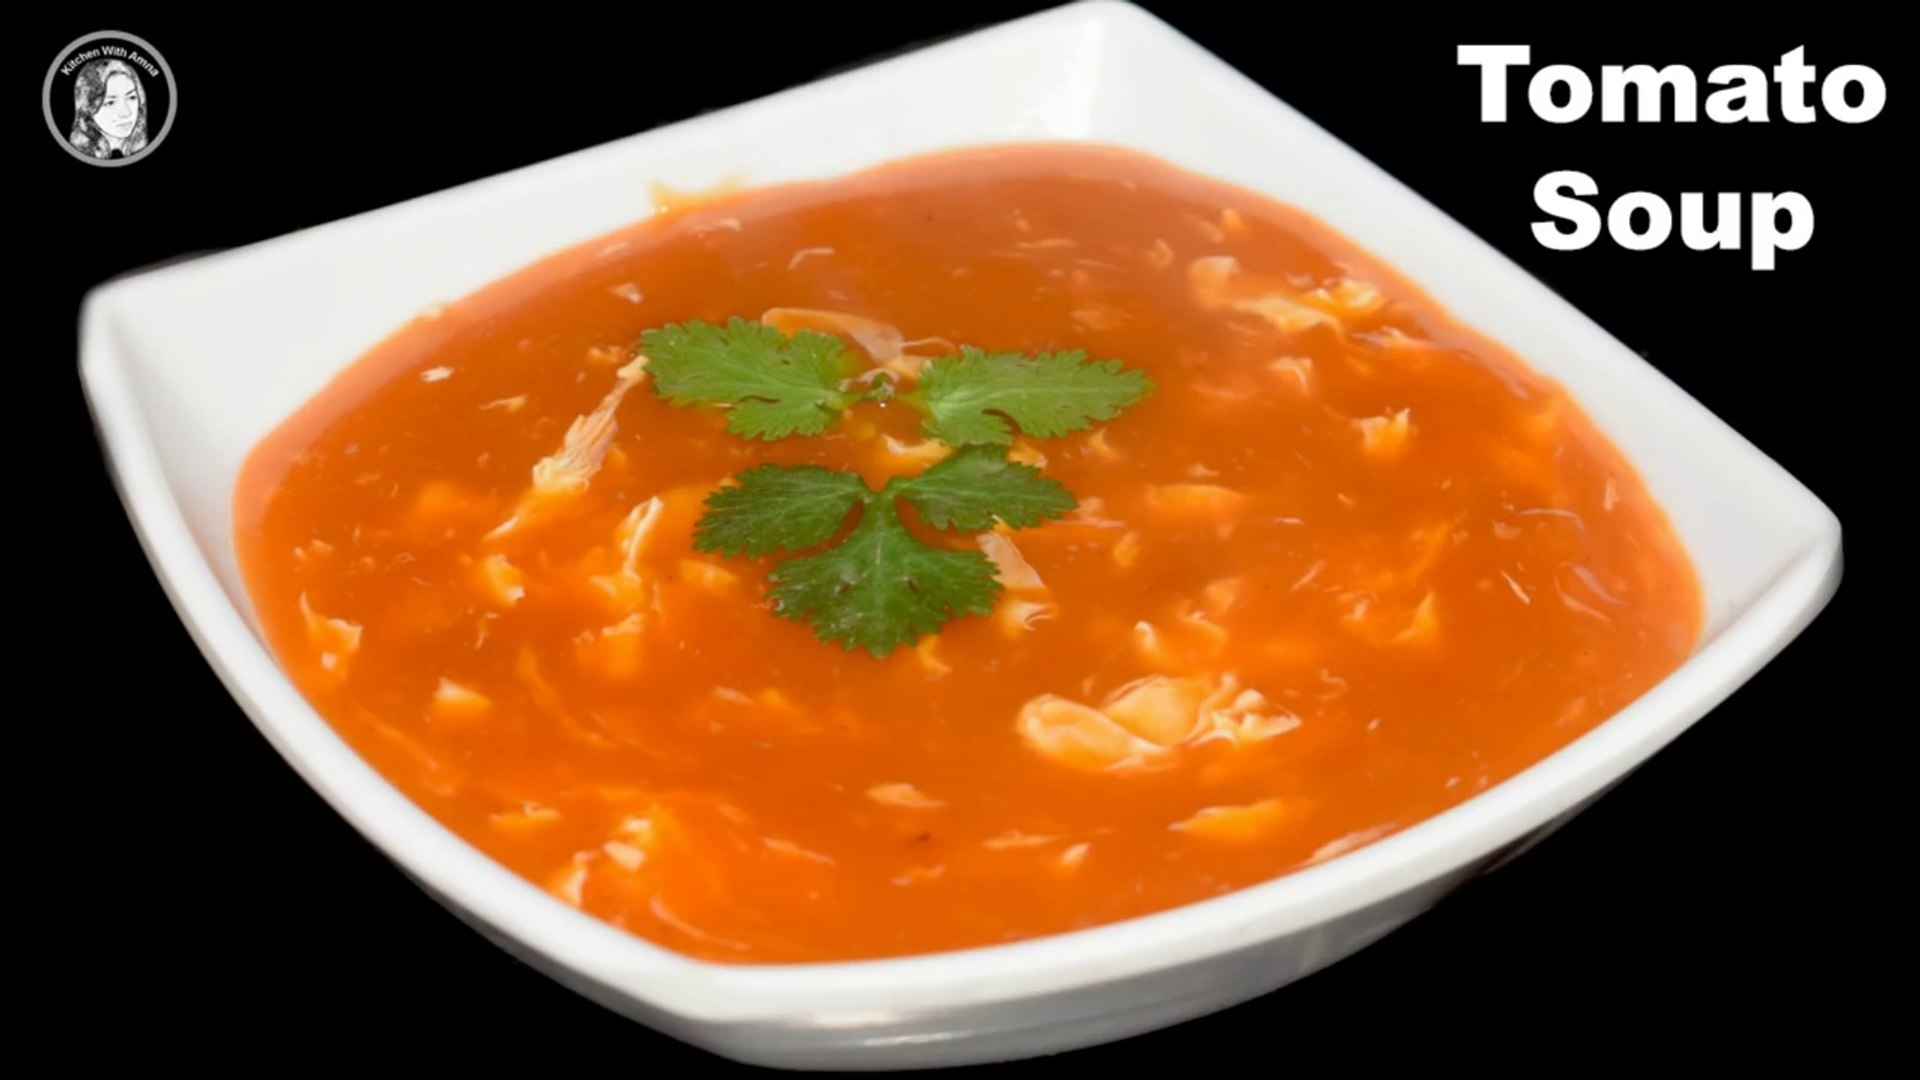 Egg Tomato Soup Recipe Tomato Soup Soup Recipes Kitchen With Amna Video Dailymotion